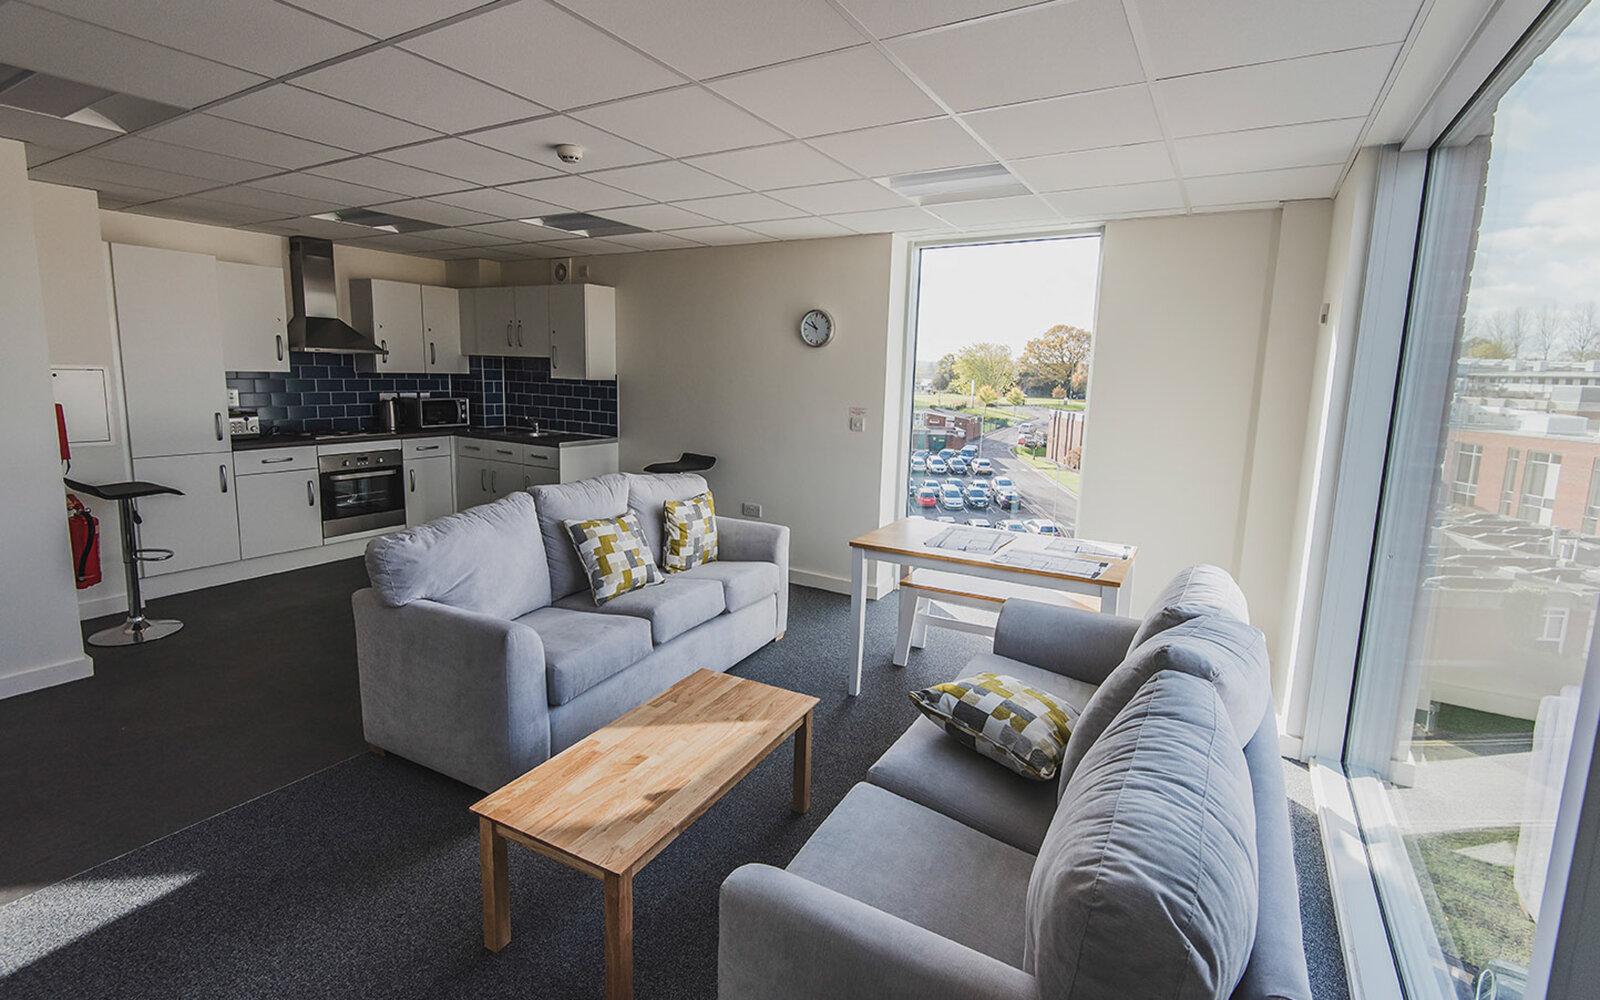 Newman University Halls of Residence interior